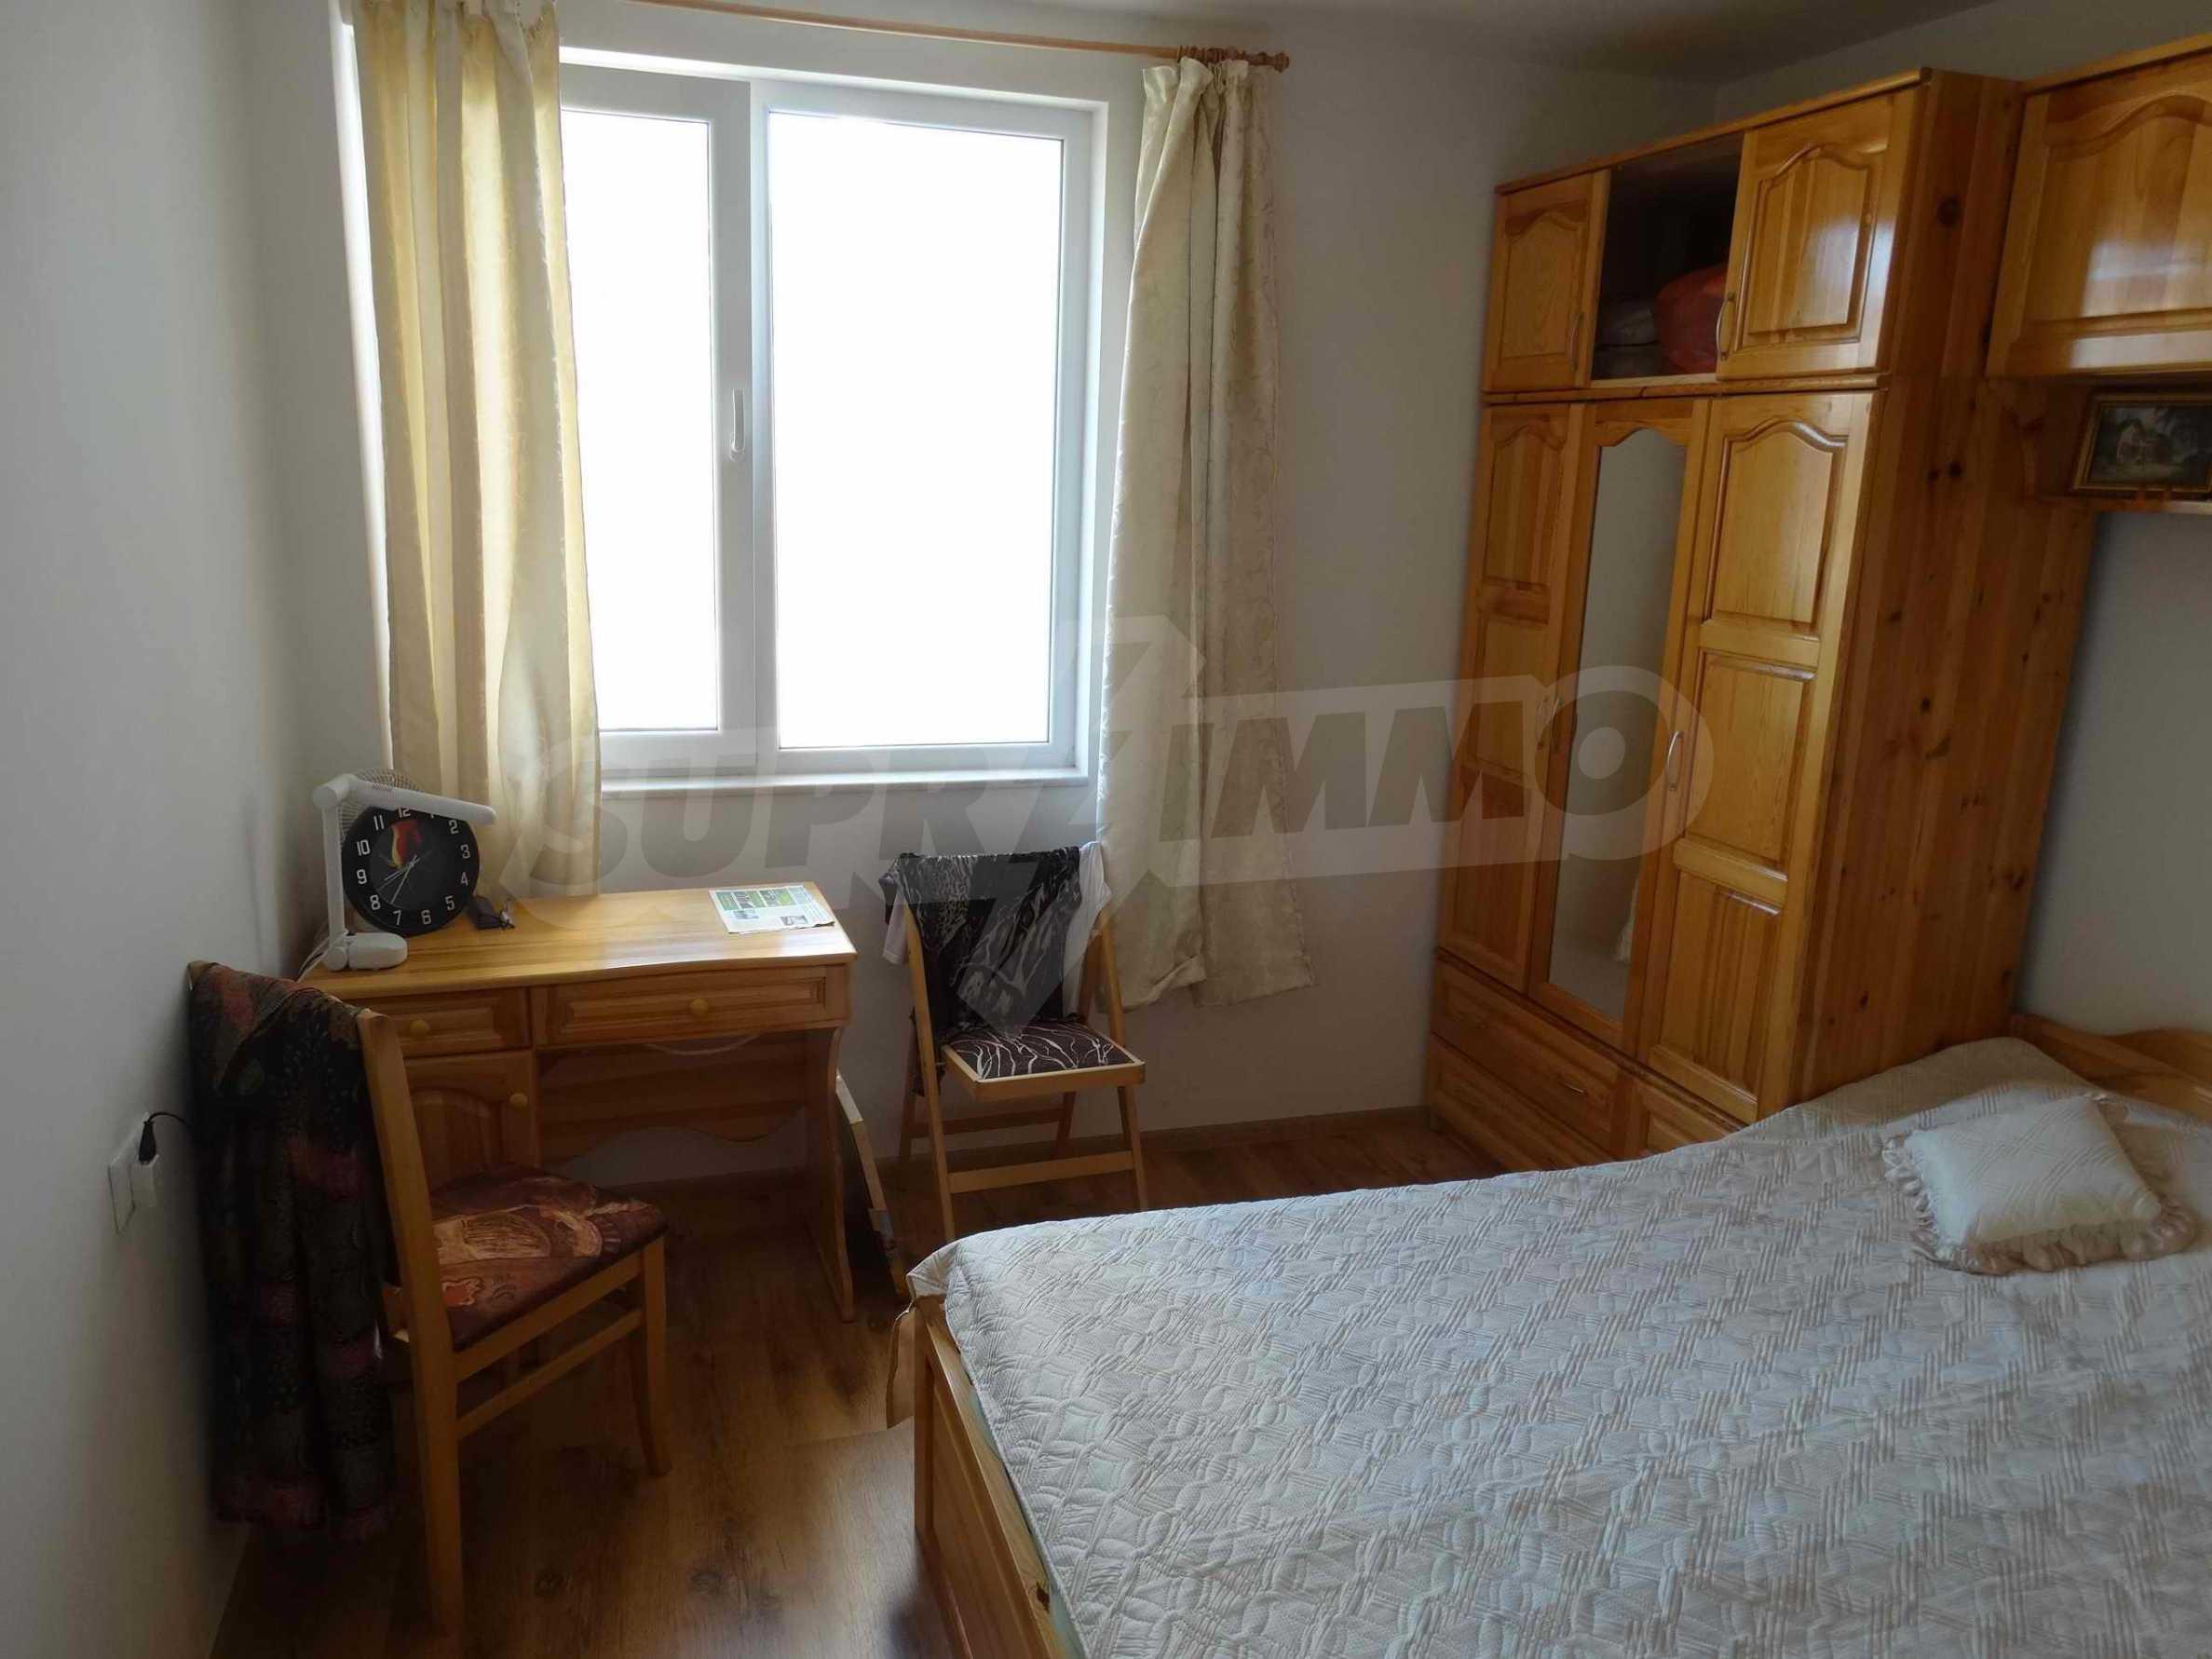 Тристаен апартамент близо до плажа в Бяла 6